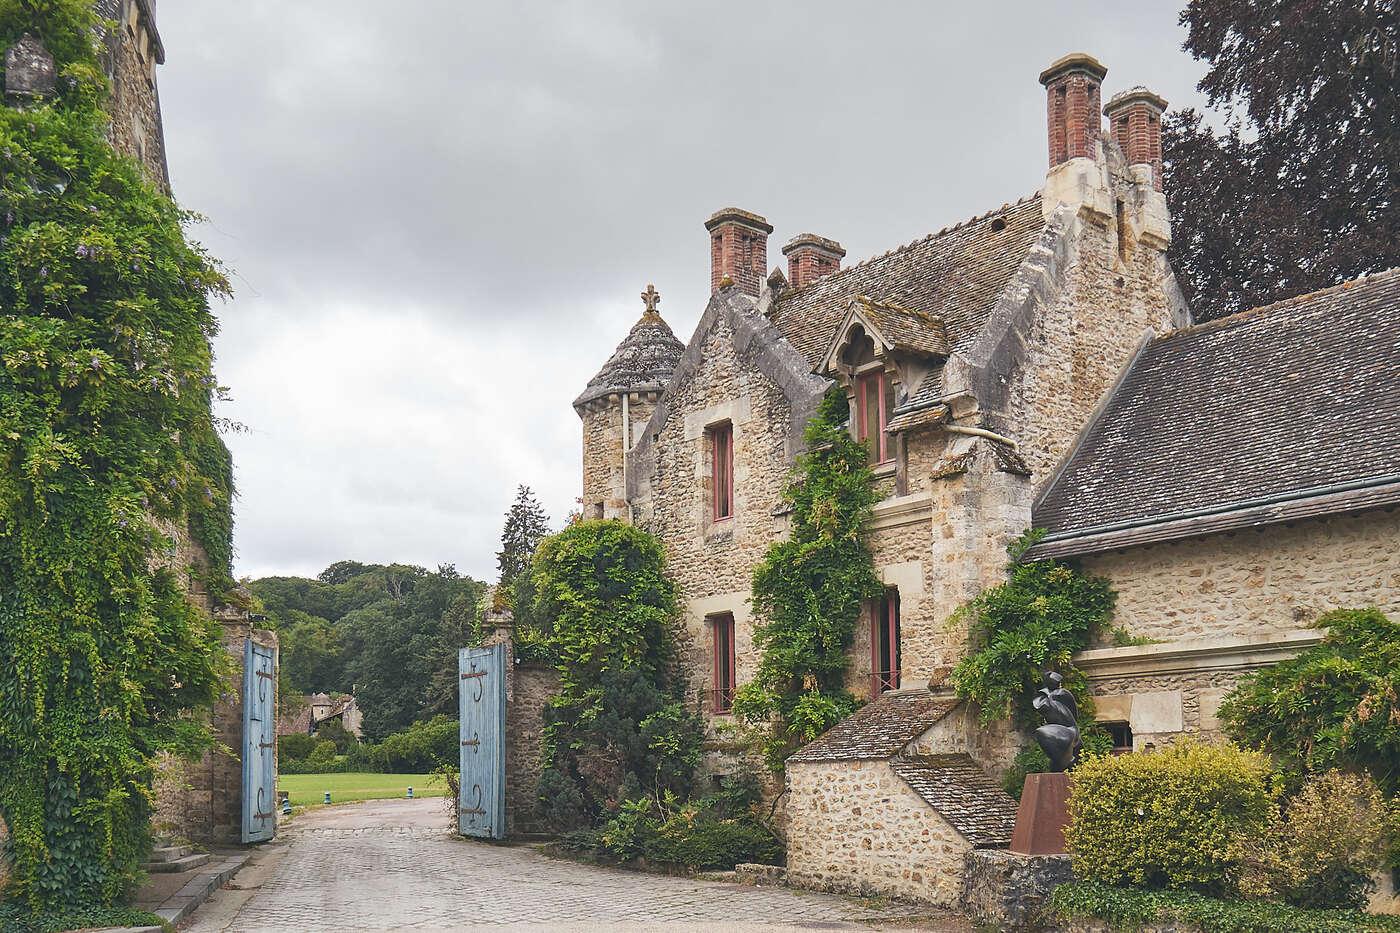 Portail de l'abbaye de Vaux-en-Cernay